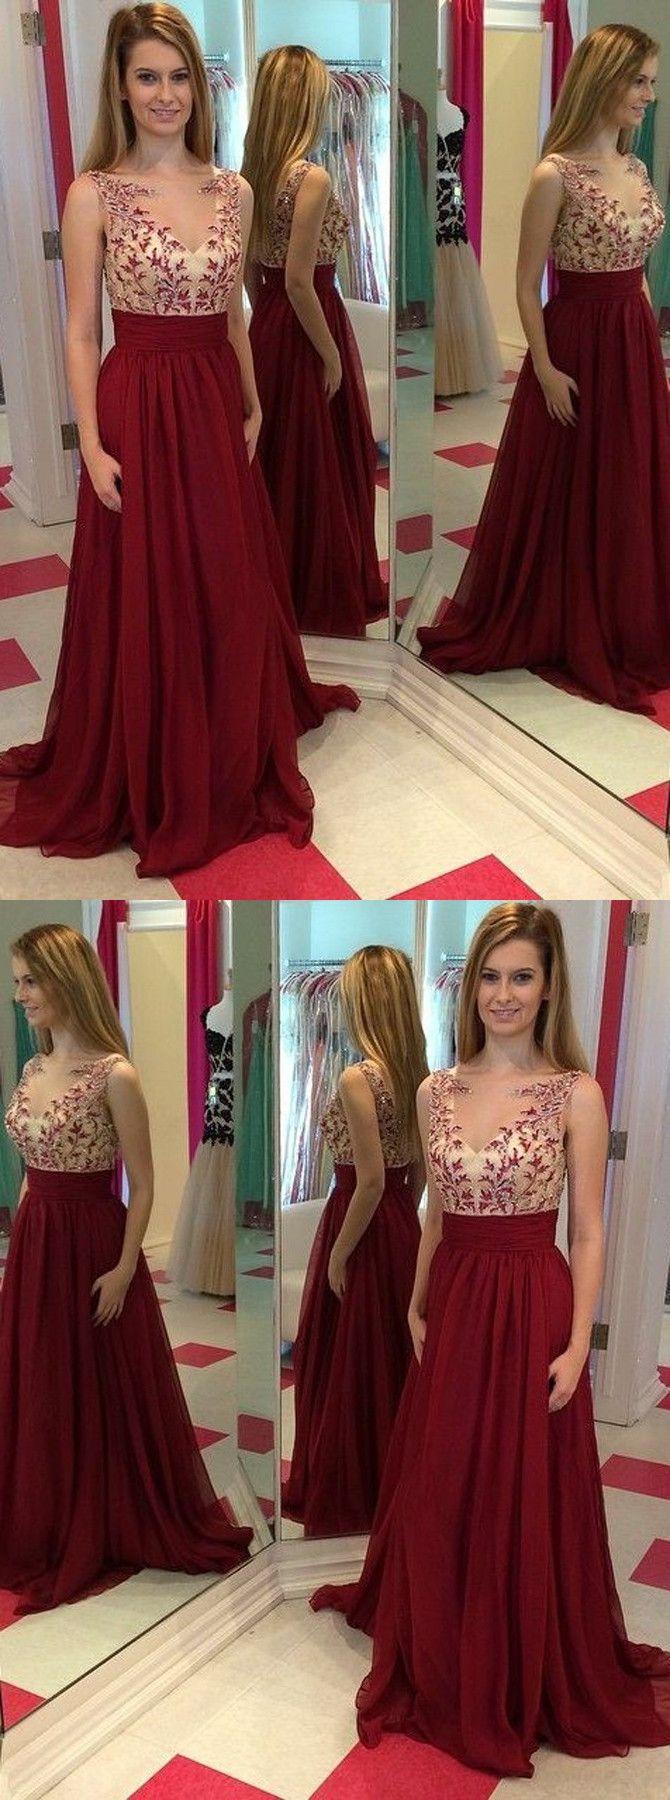 Oneck appliques aline prom dresseslong prom dressesgreen prom